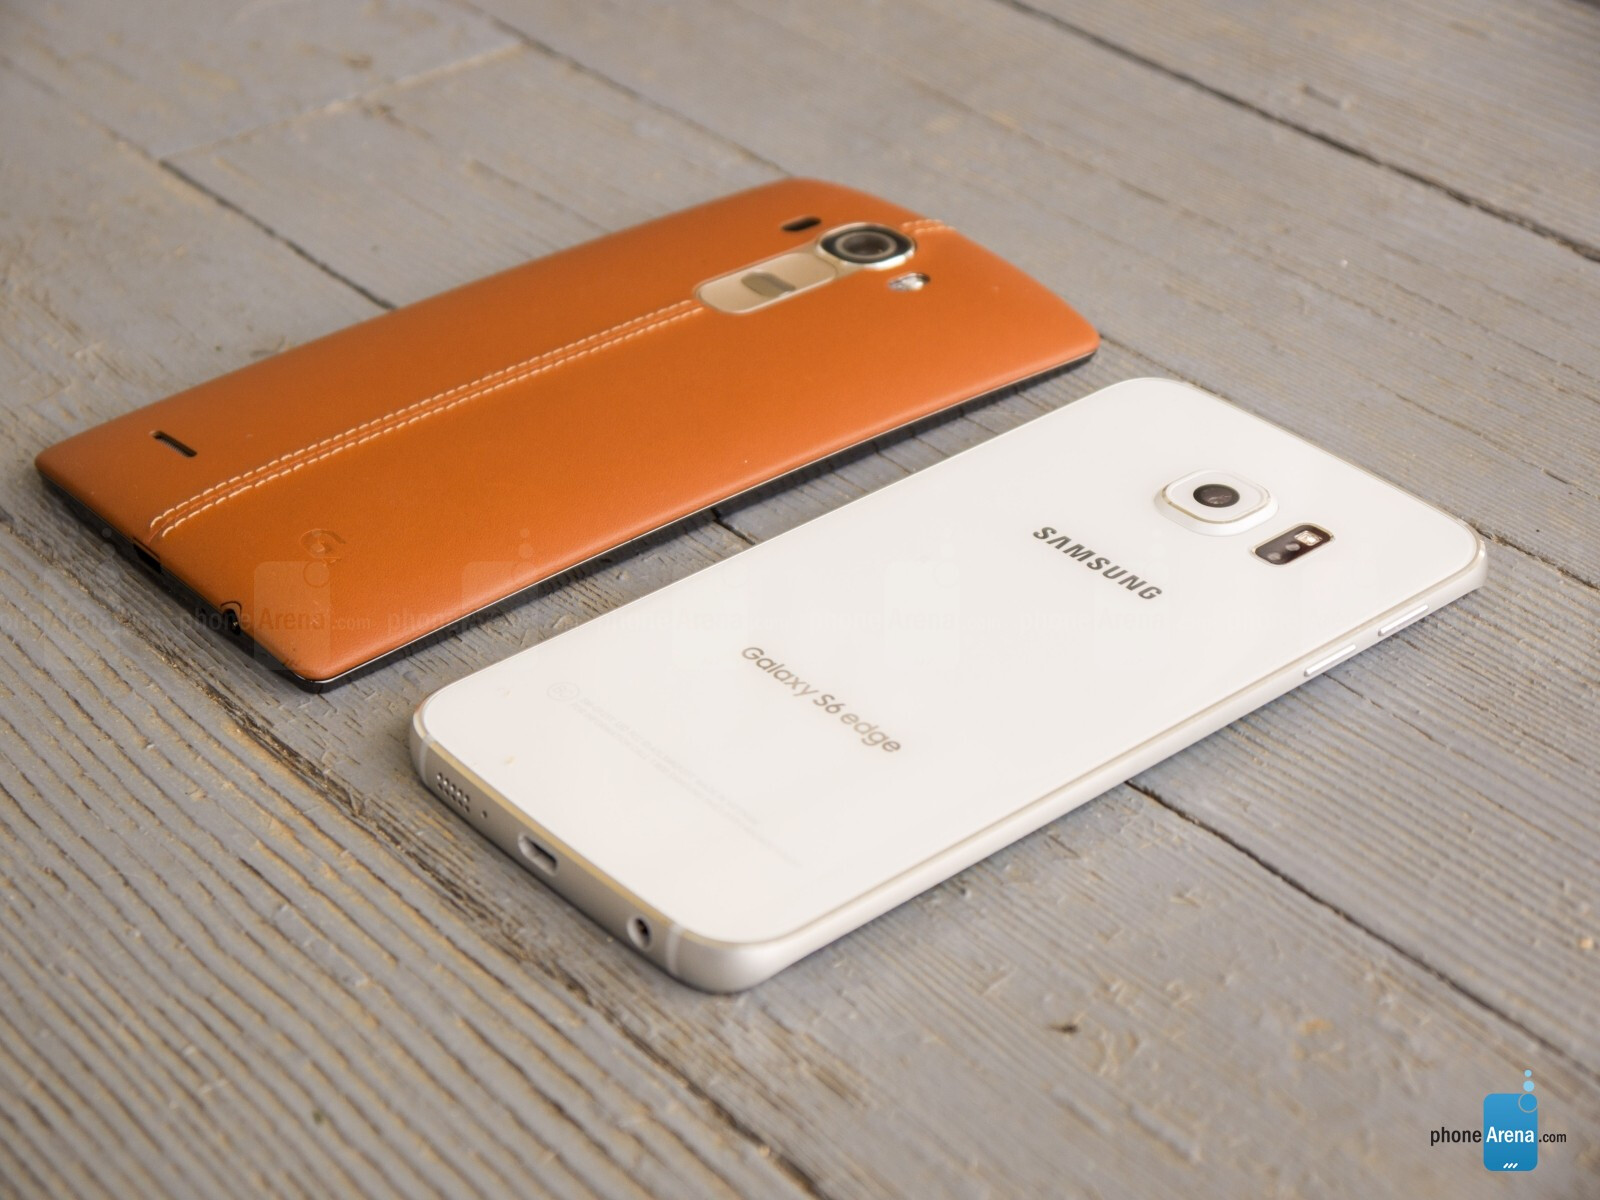 Lg G4 Vs Galaxy S7 Edge: LG G4 Vs Samsung Galaxy S6 Edge